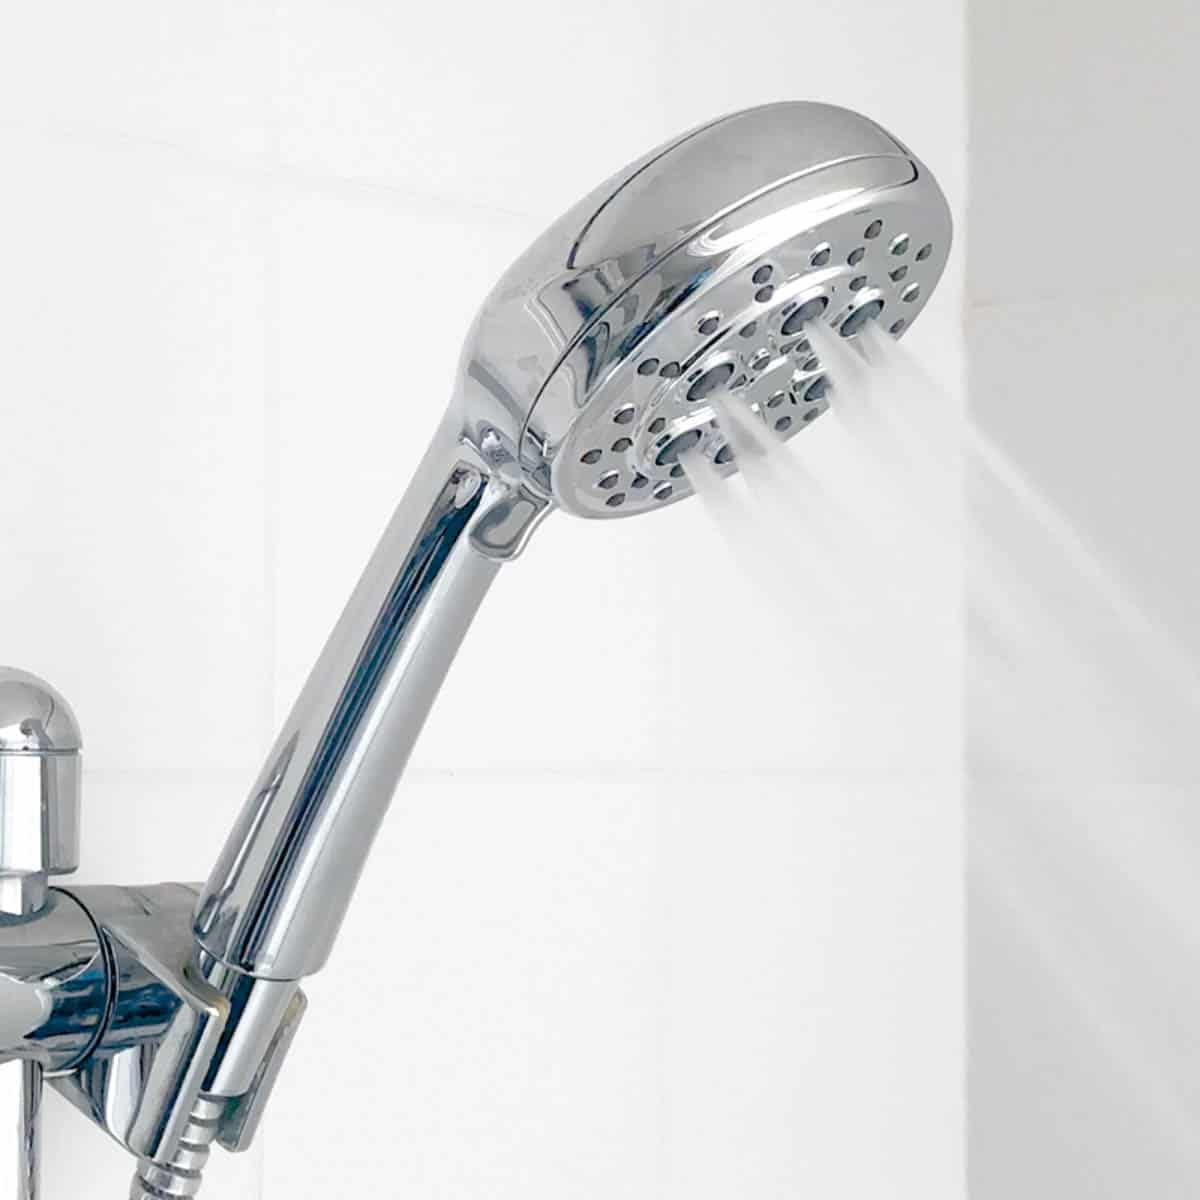 Pfister Vie showerhead on HydroDrench setting